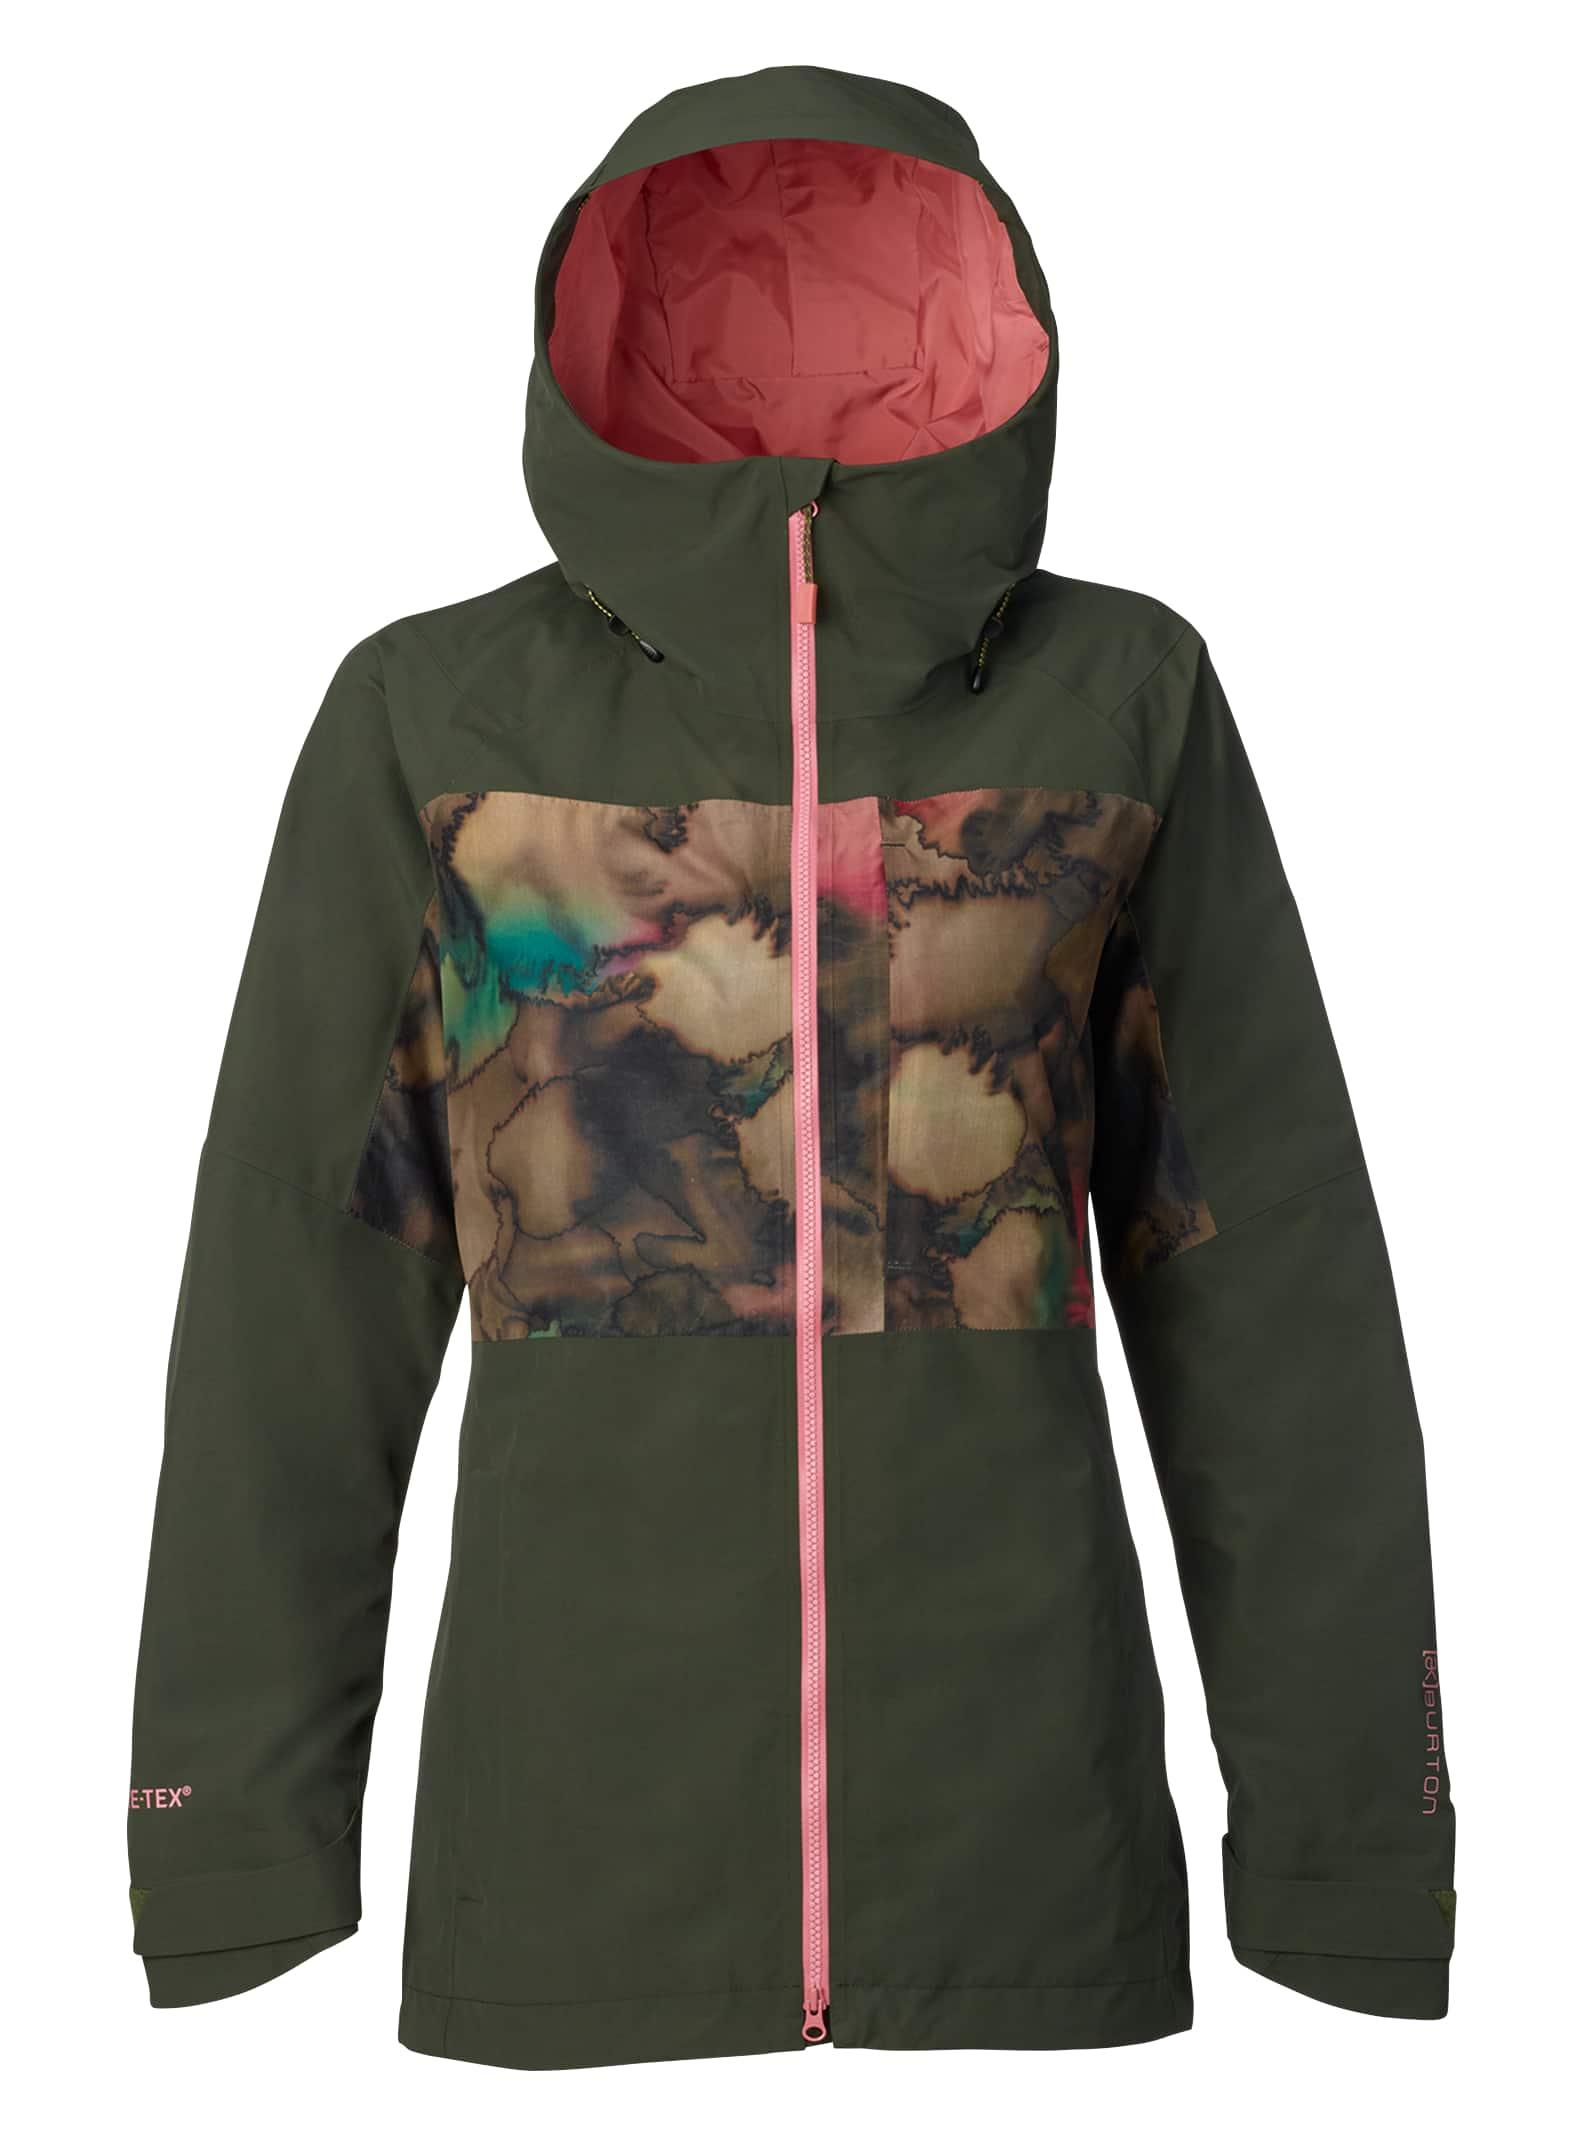 Women's burton jacket features package